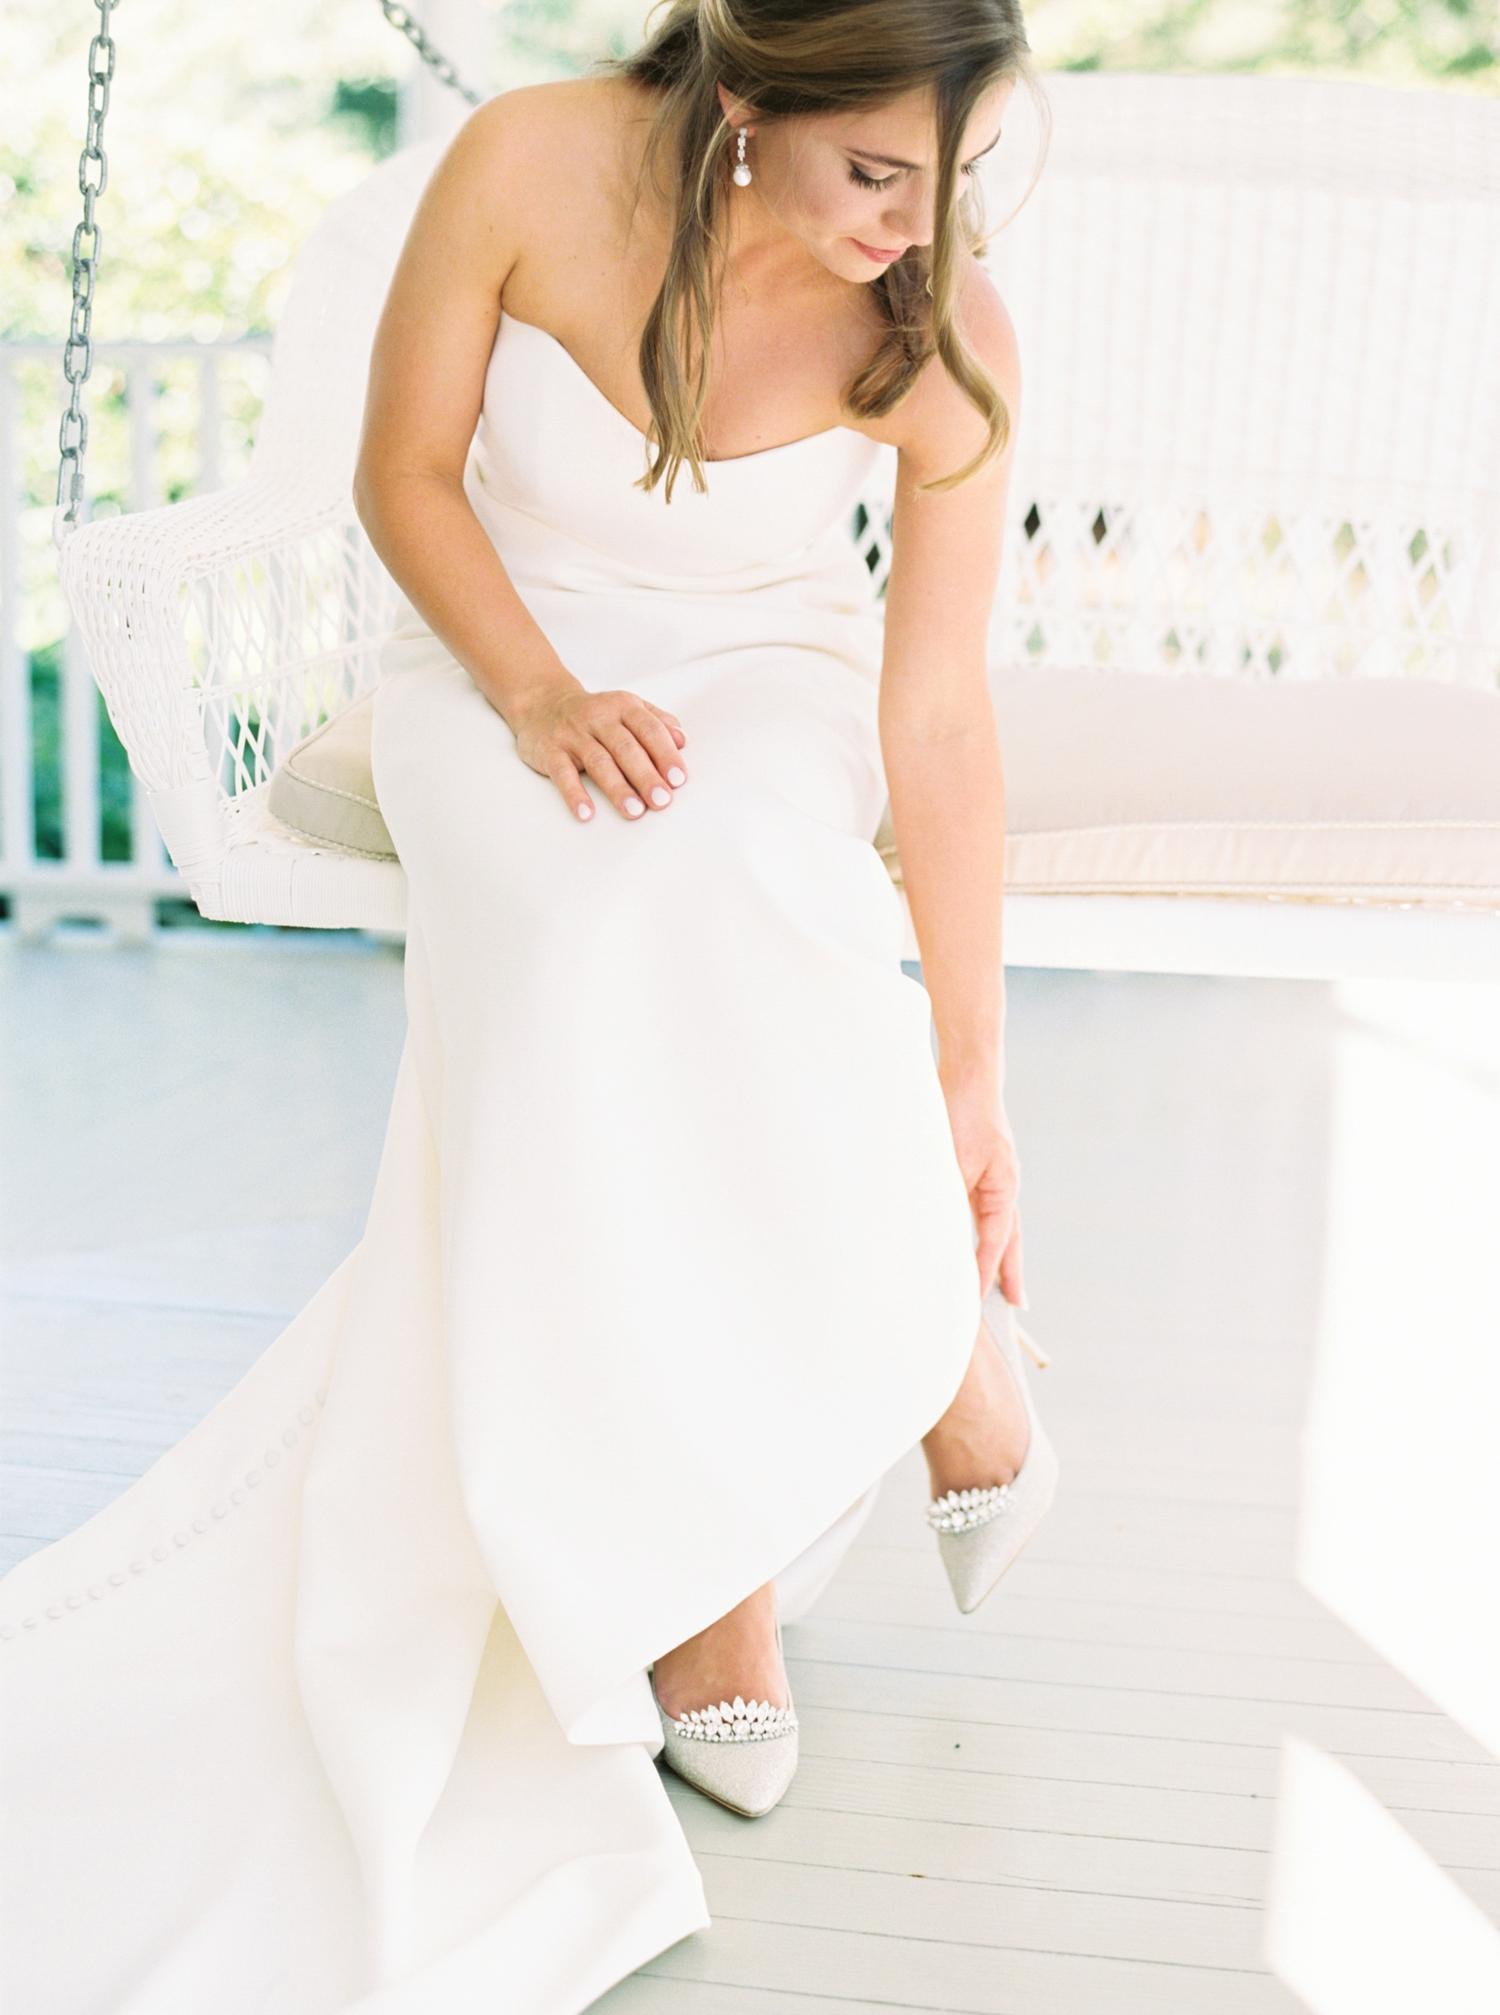 new orleans wedding photographer_0019.jpg